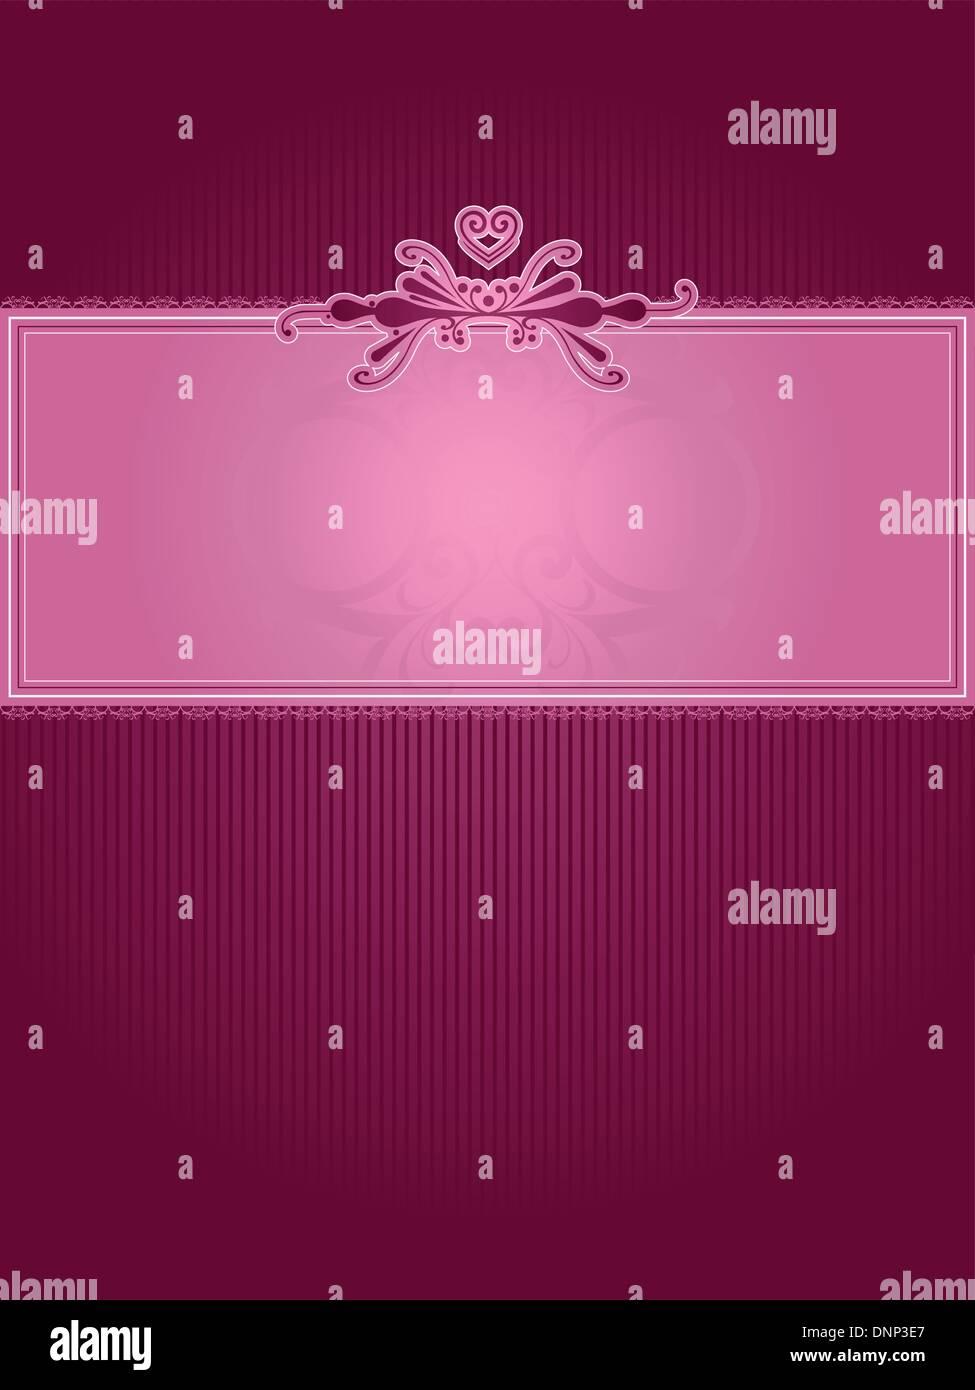 Decorative Valentines background - Stock Image